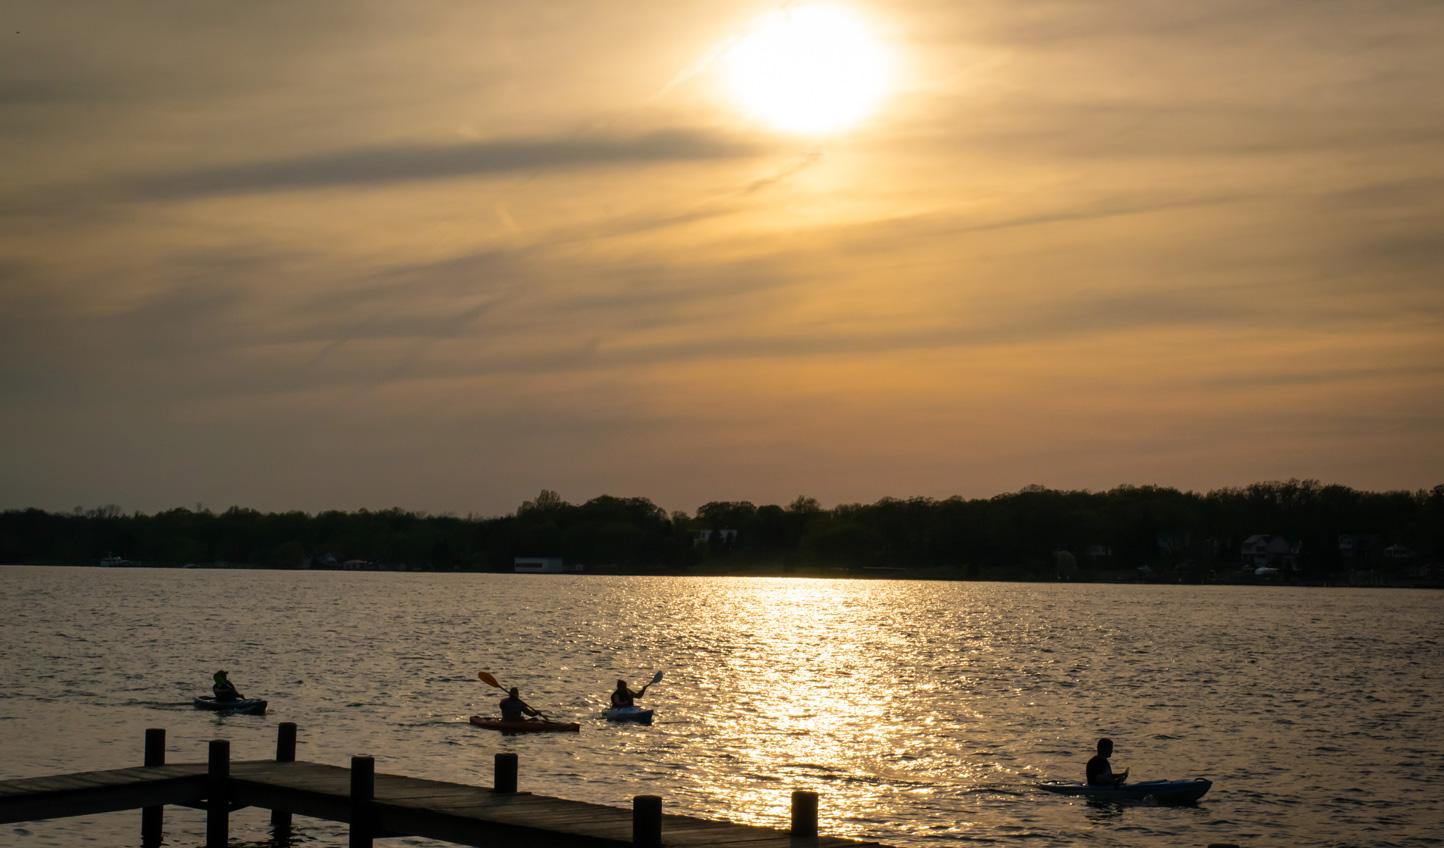 Kayak down the quieter waters of Niagara River